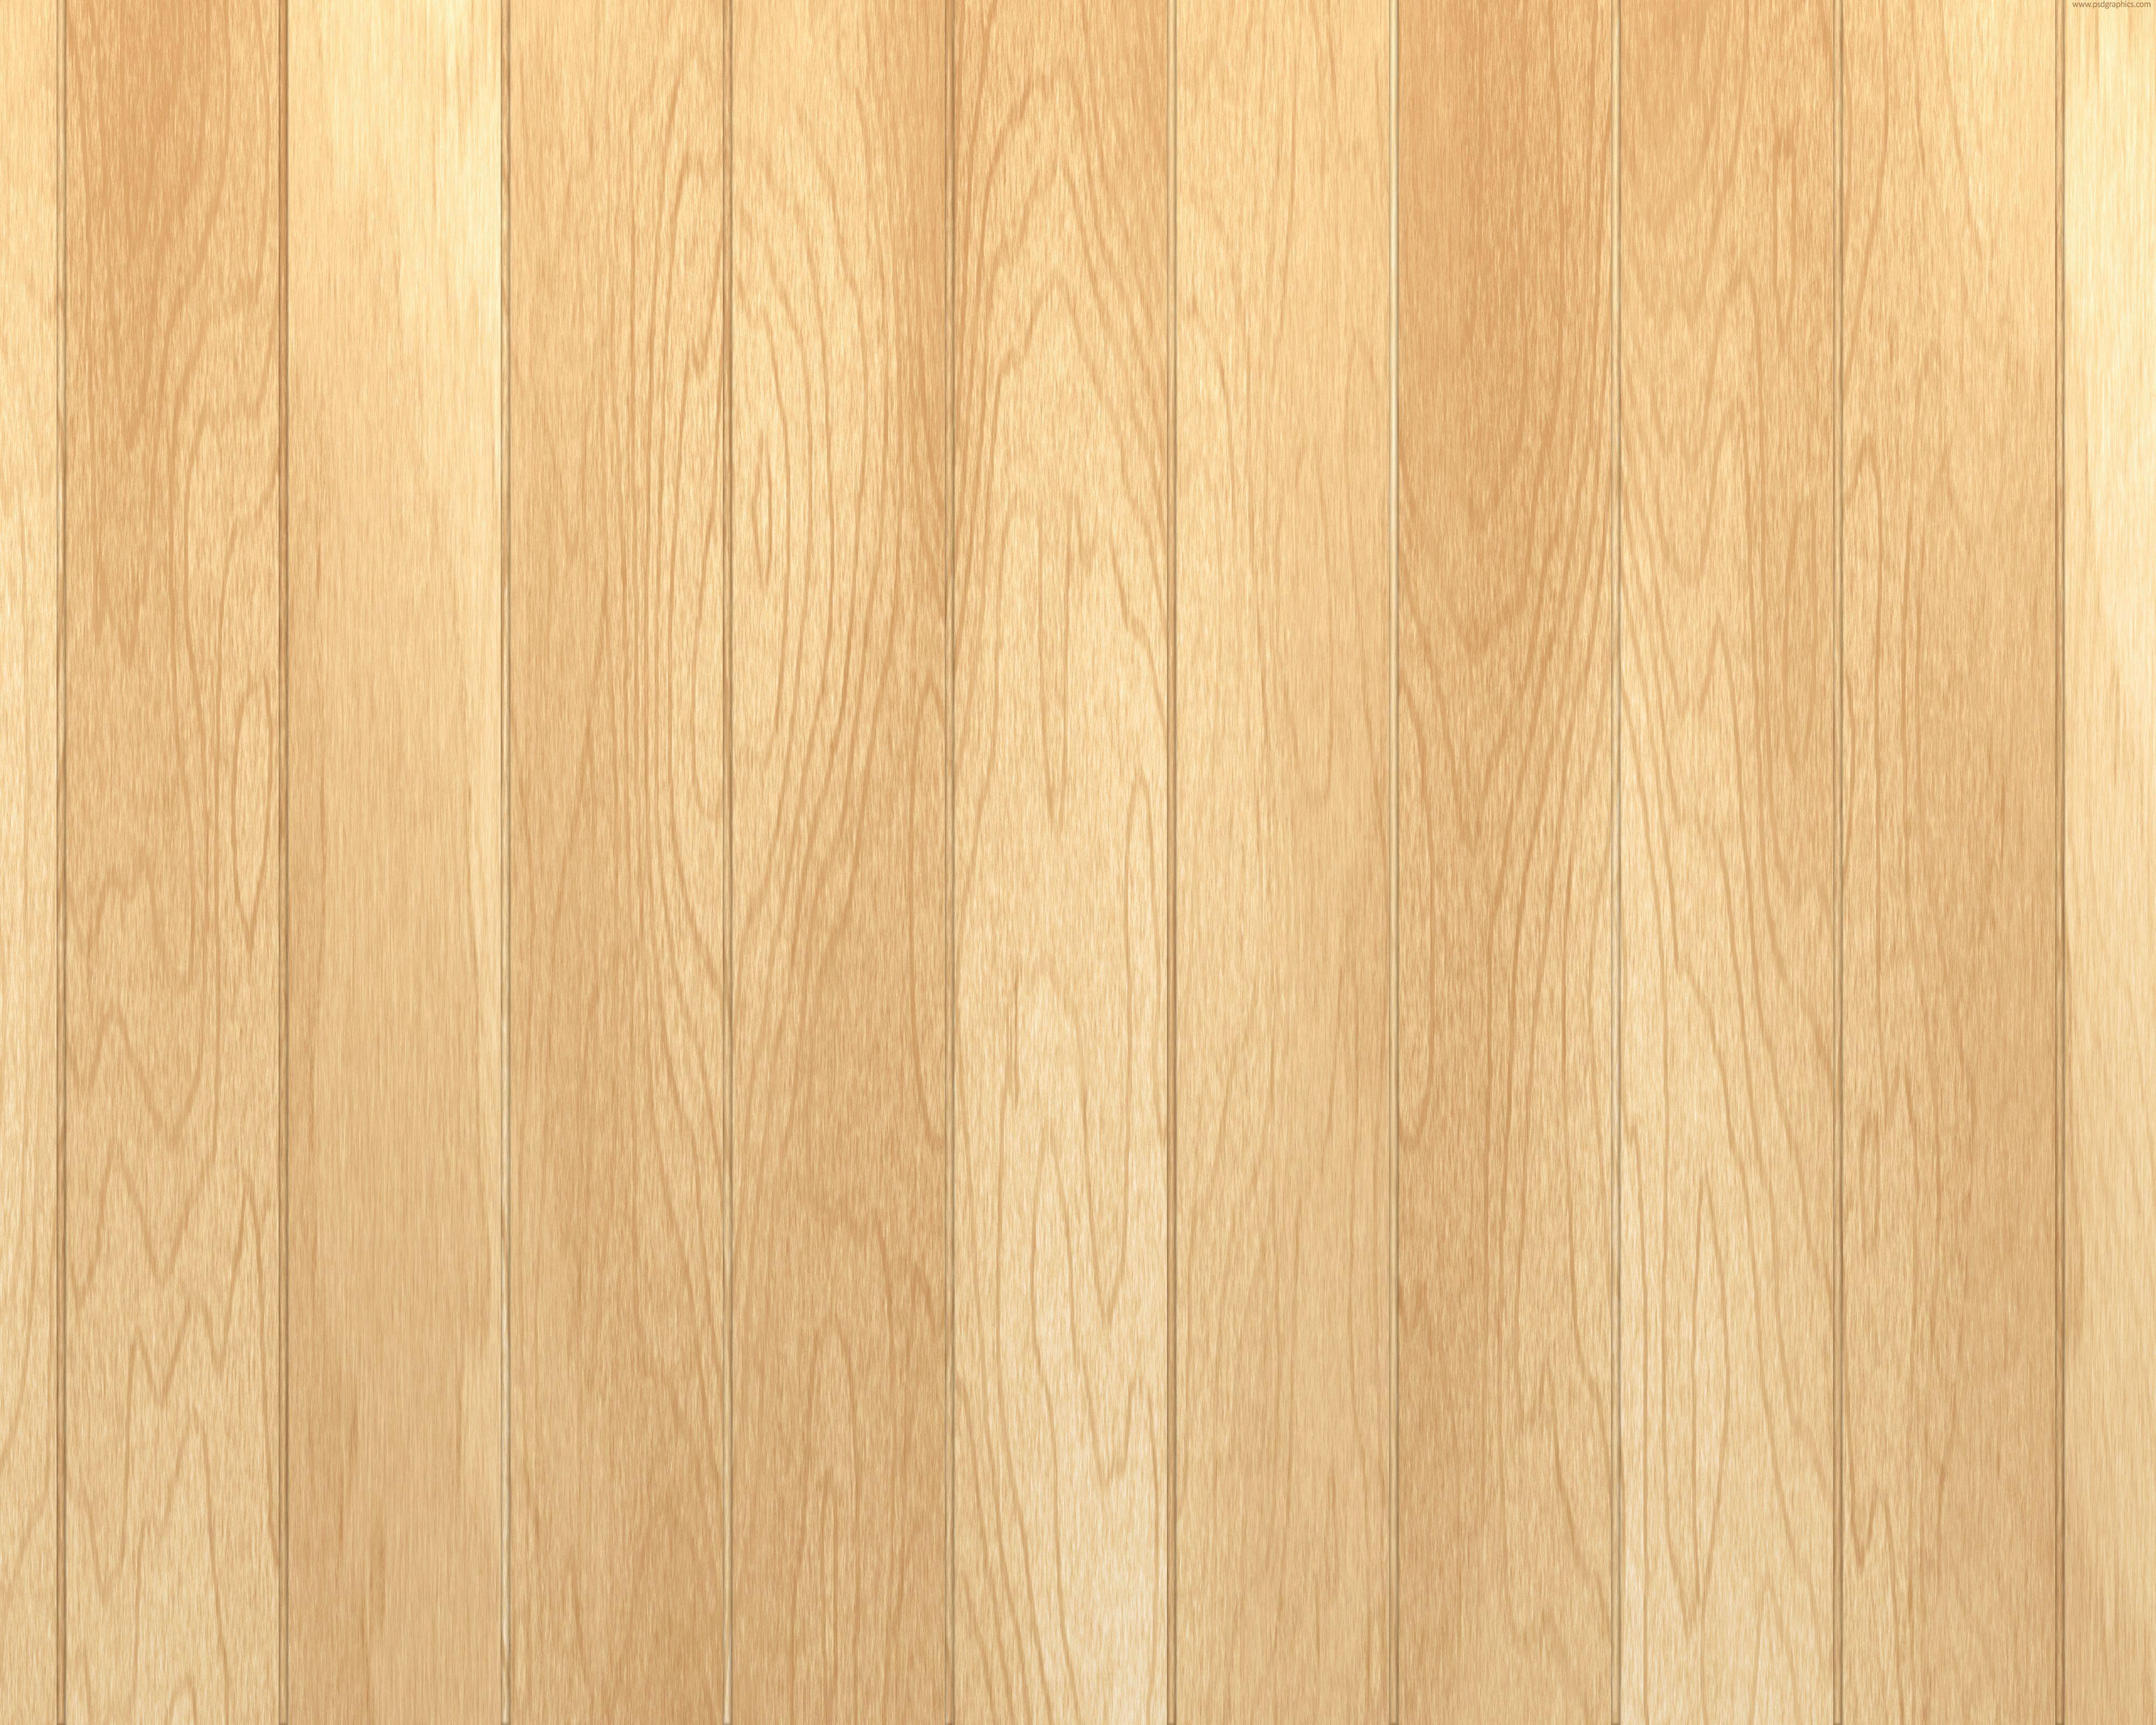 lightwoodentabletexturewoodtabletexture.jpg (4000